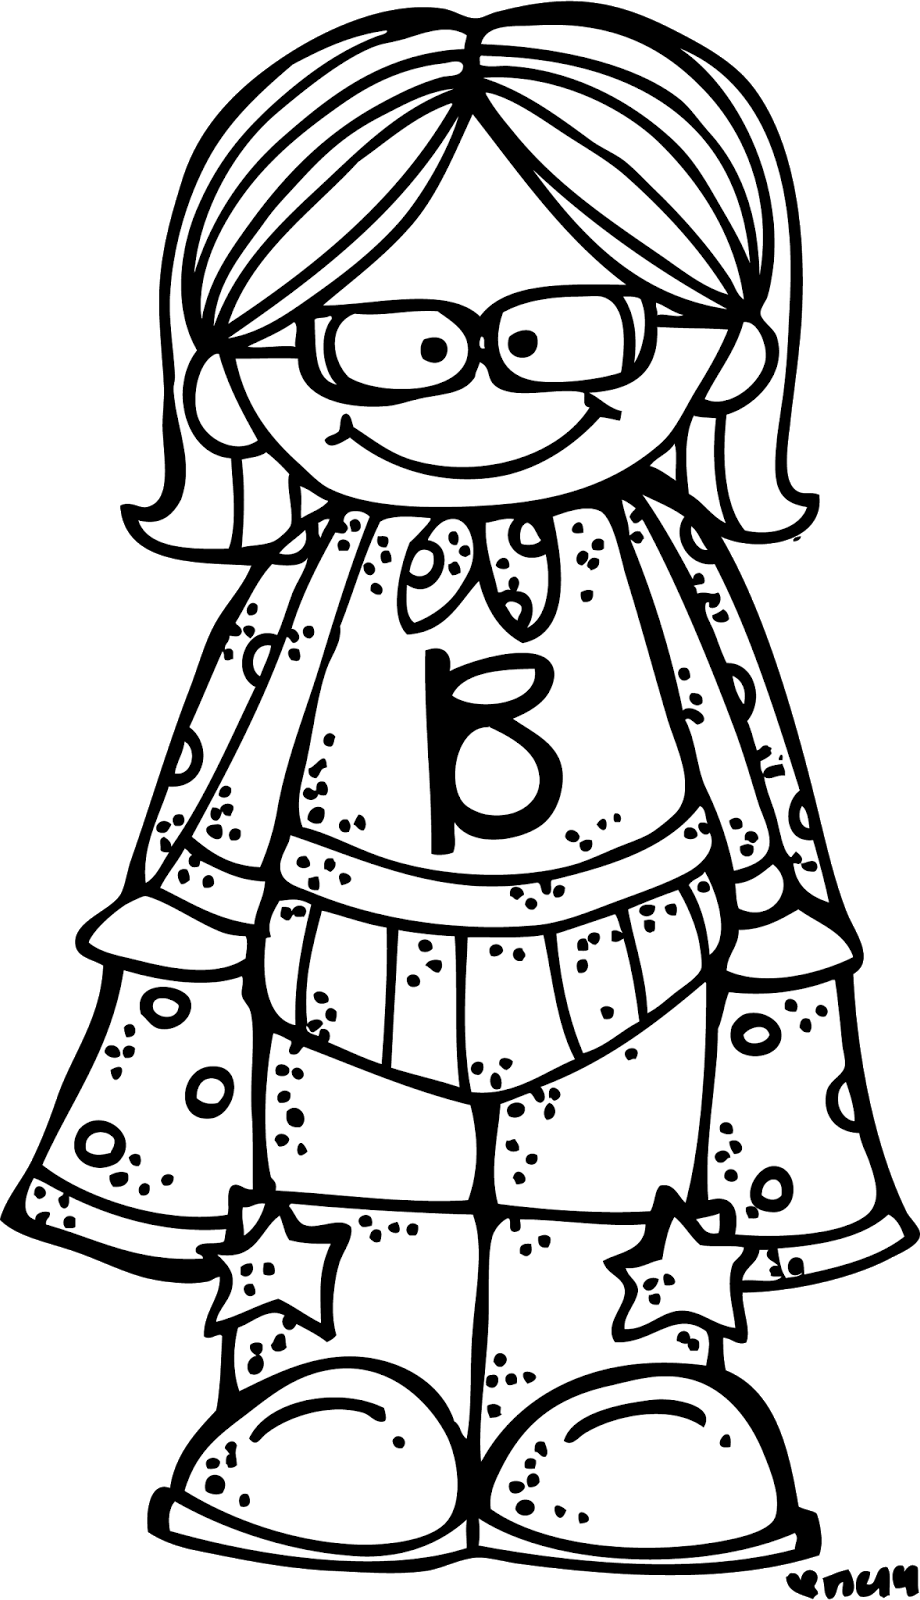 Melonheadz Dibujos Dibujos Bonitos Maestra Caricatura